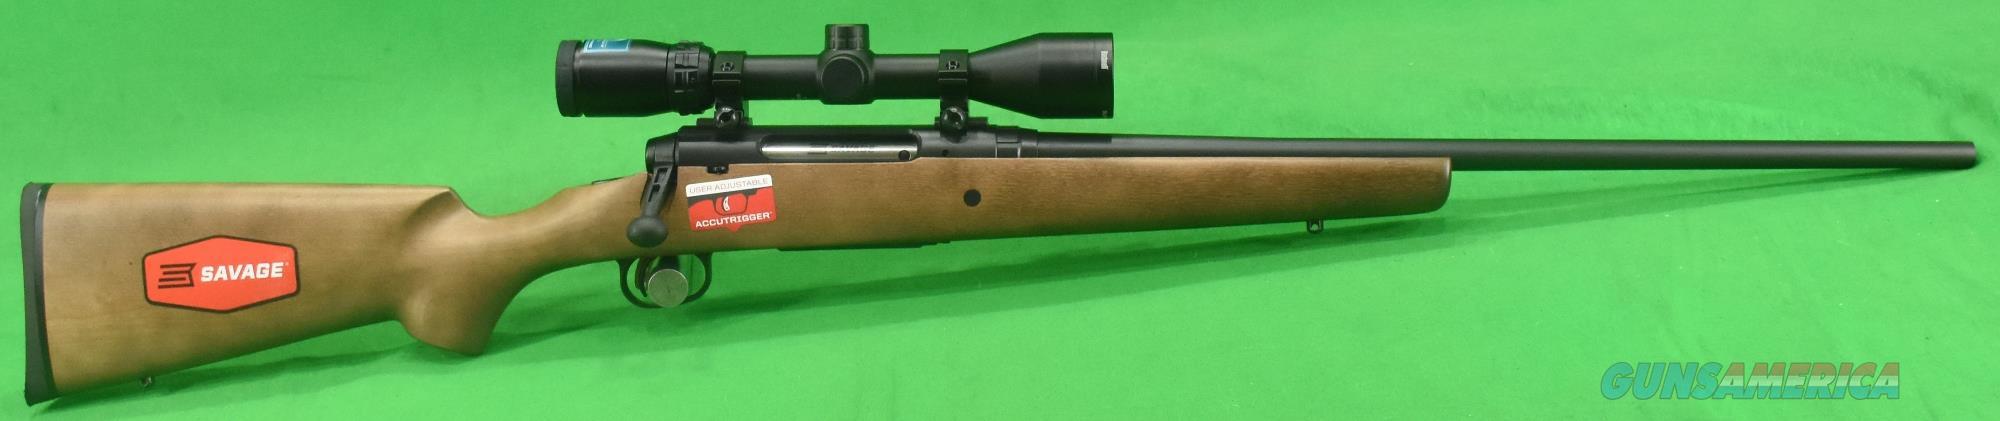 Axis II XP Hardwood 6.5CM 22In  22678  Guns > Rifles > Savage Rifles > Accutrigger Models > Sporting